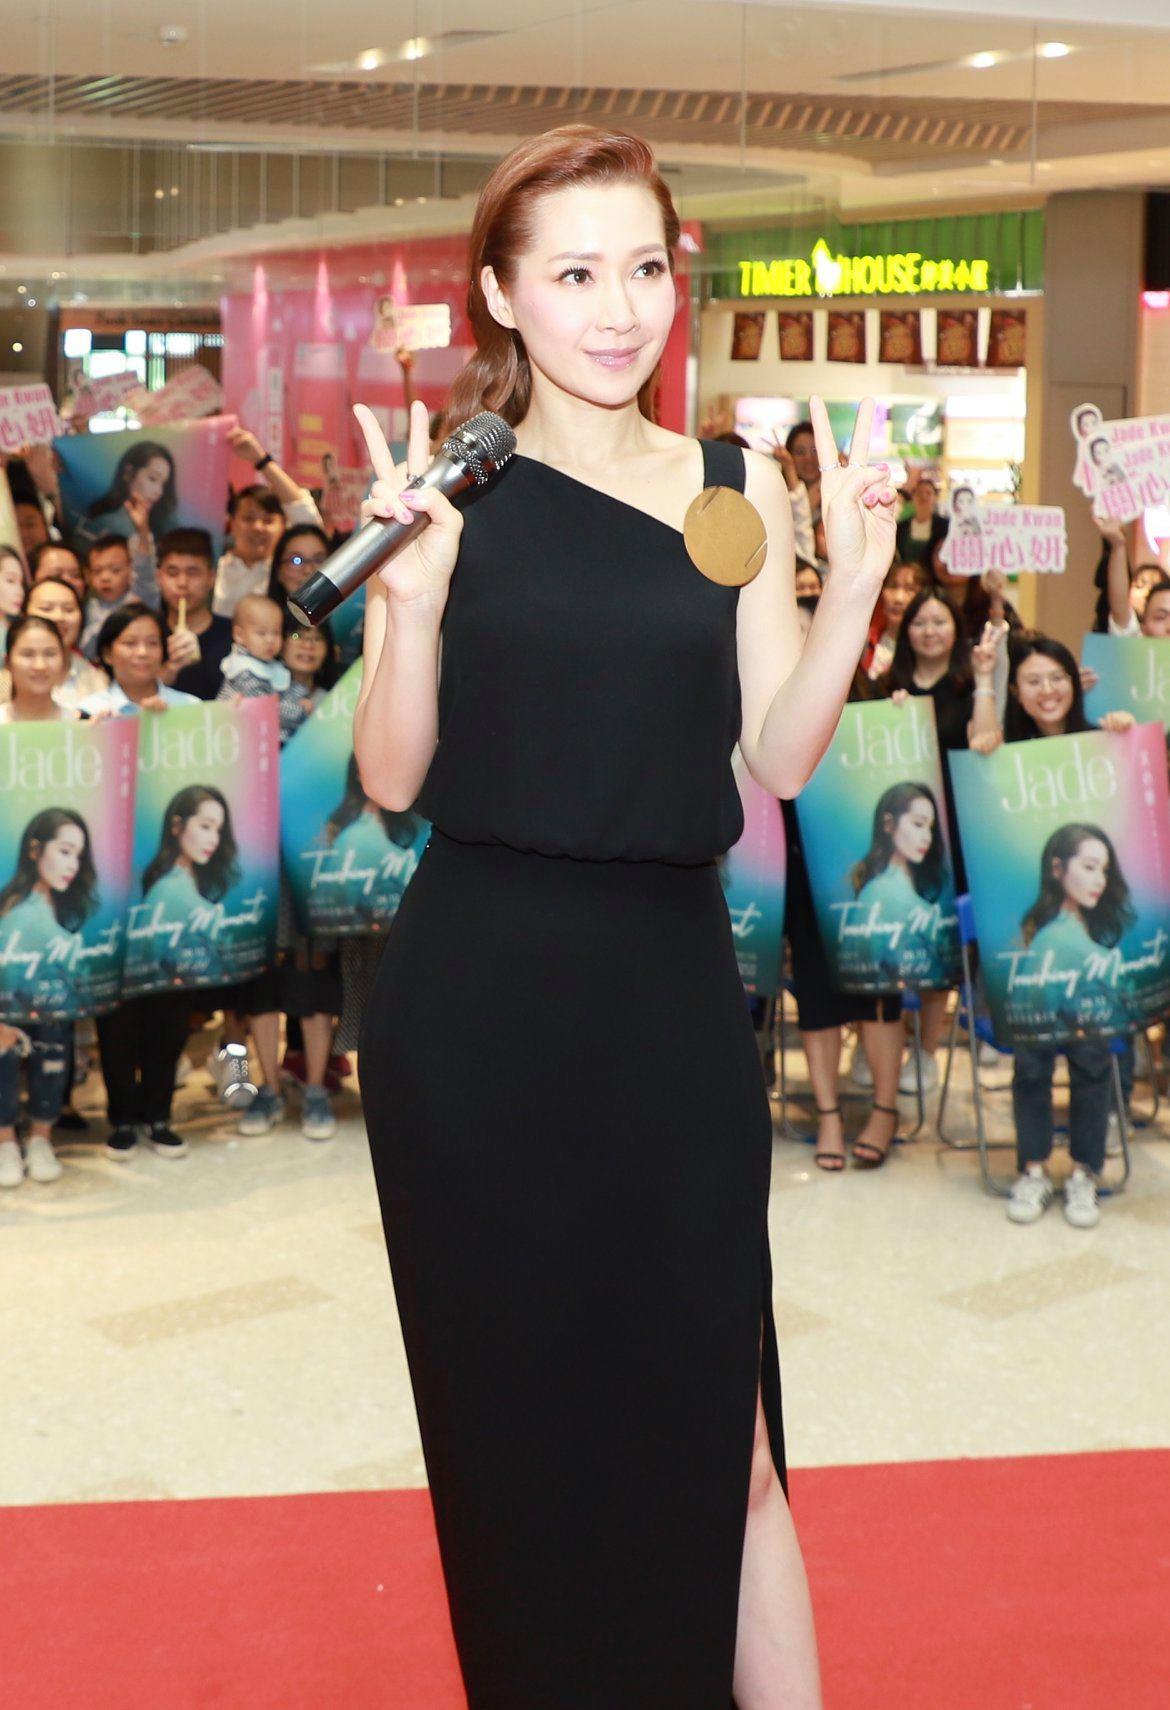 2019年11月12日Hong Kong Singer Channel fb Channel特寫關心妍望一兩年後與愛女齊齊義唱c